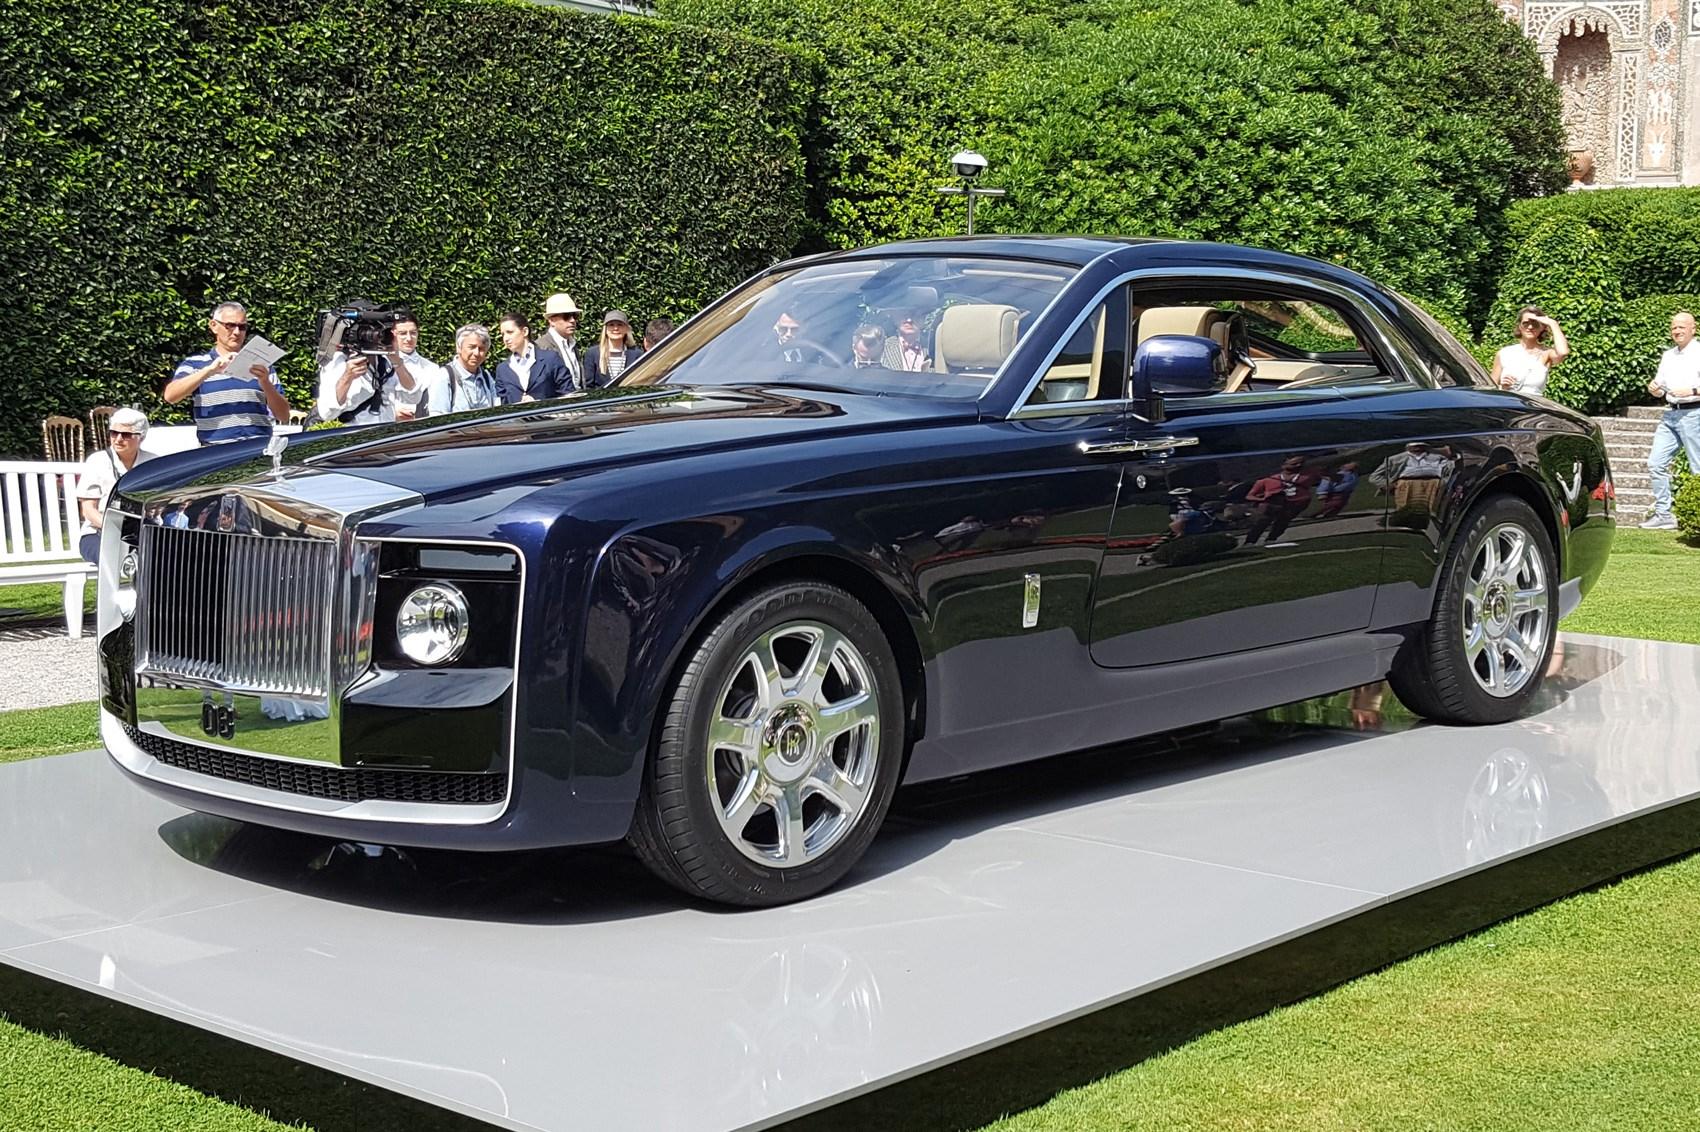 Вшоу-руме Роллс Ройс появился автомобиль Sweptail за13 млн. долларов